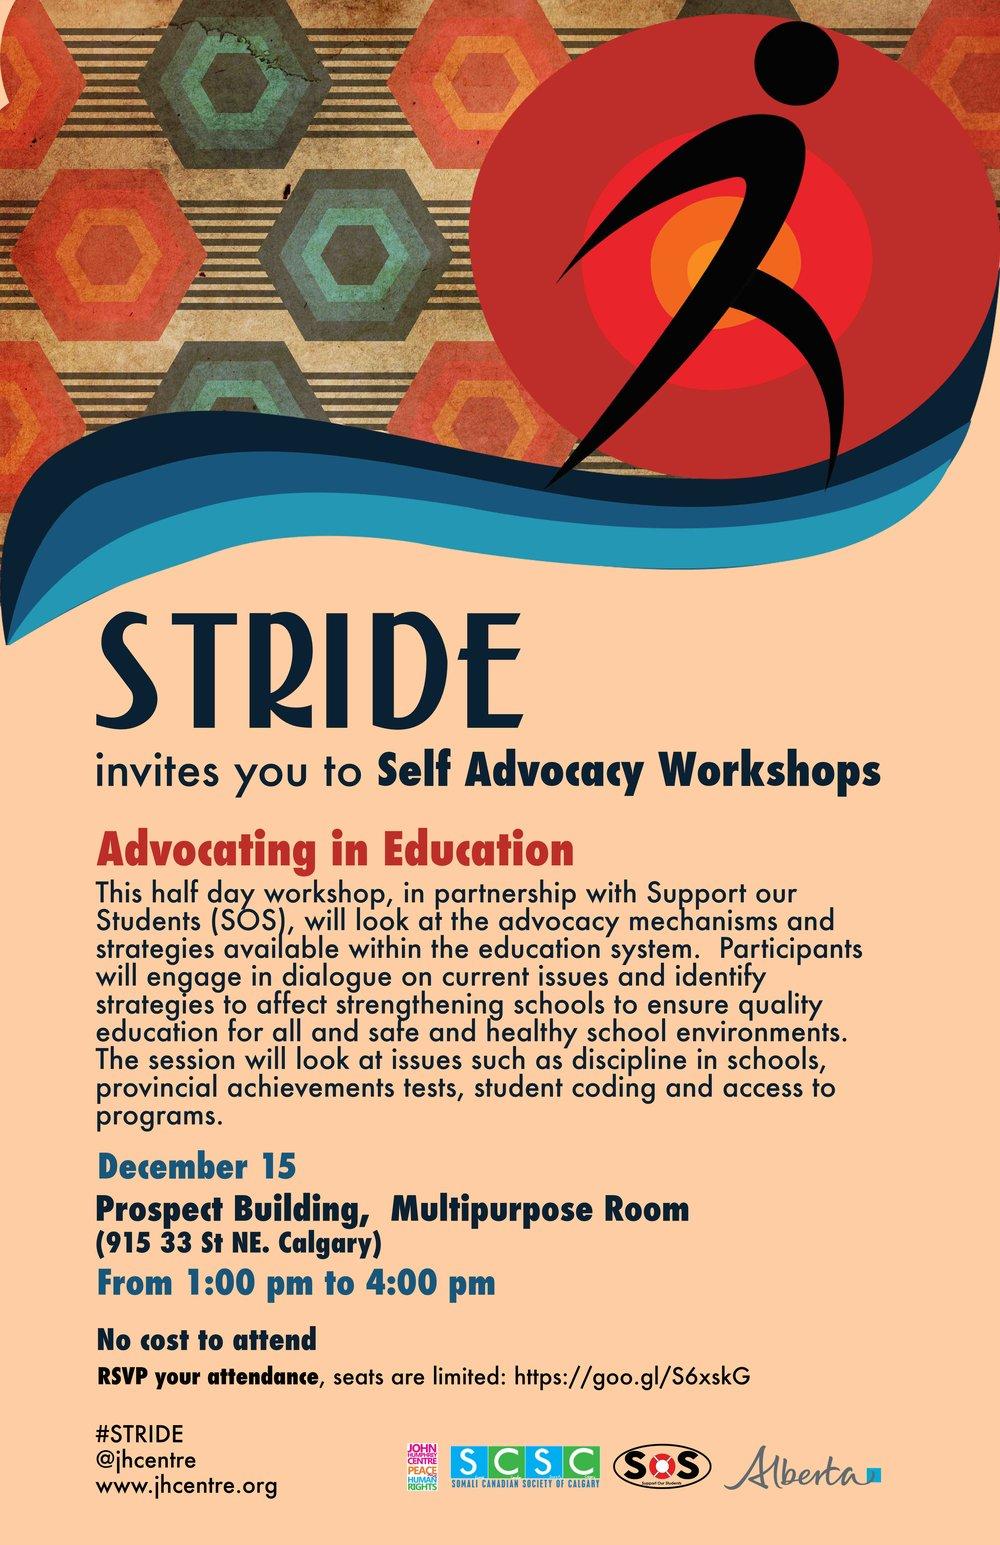 Advocating in Education Calgary Dec. 15